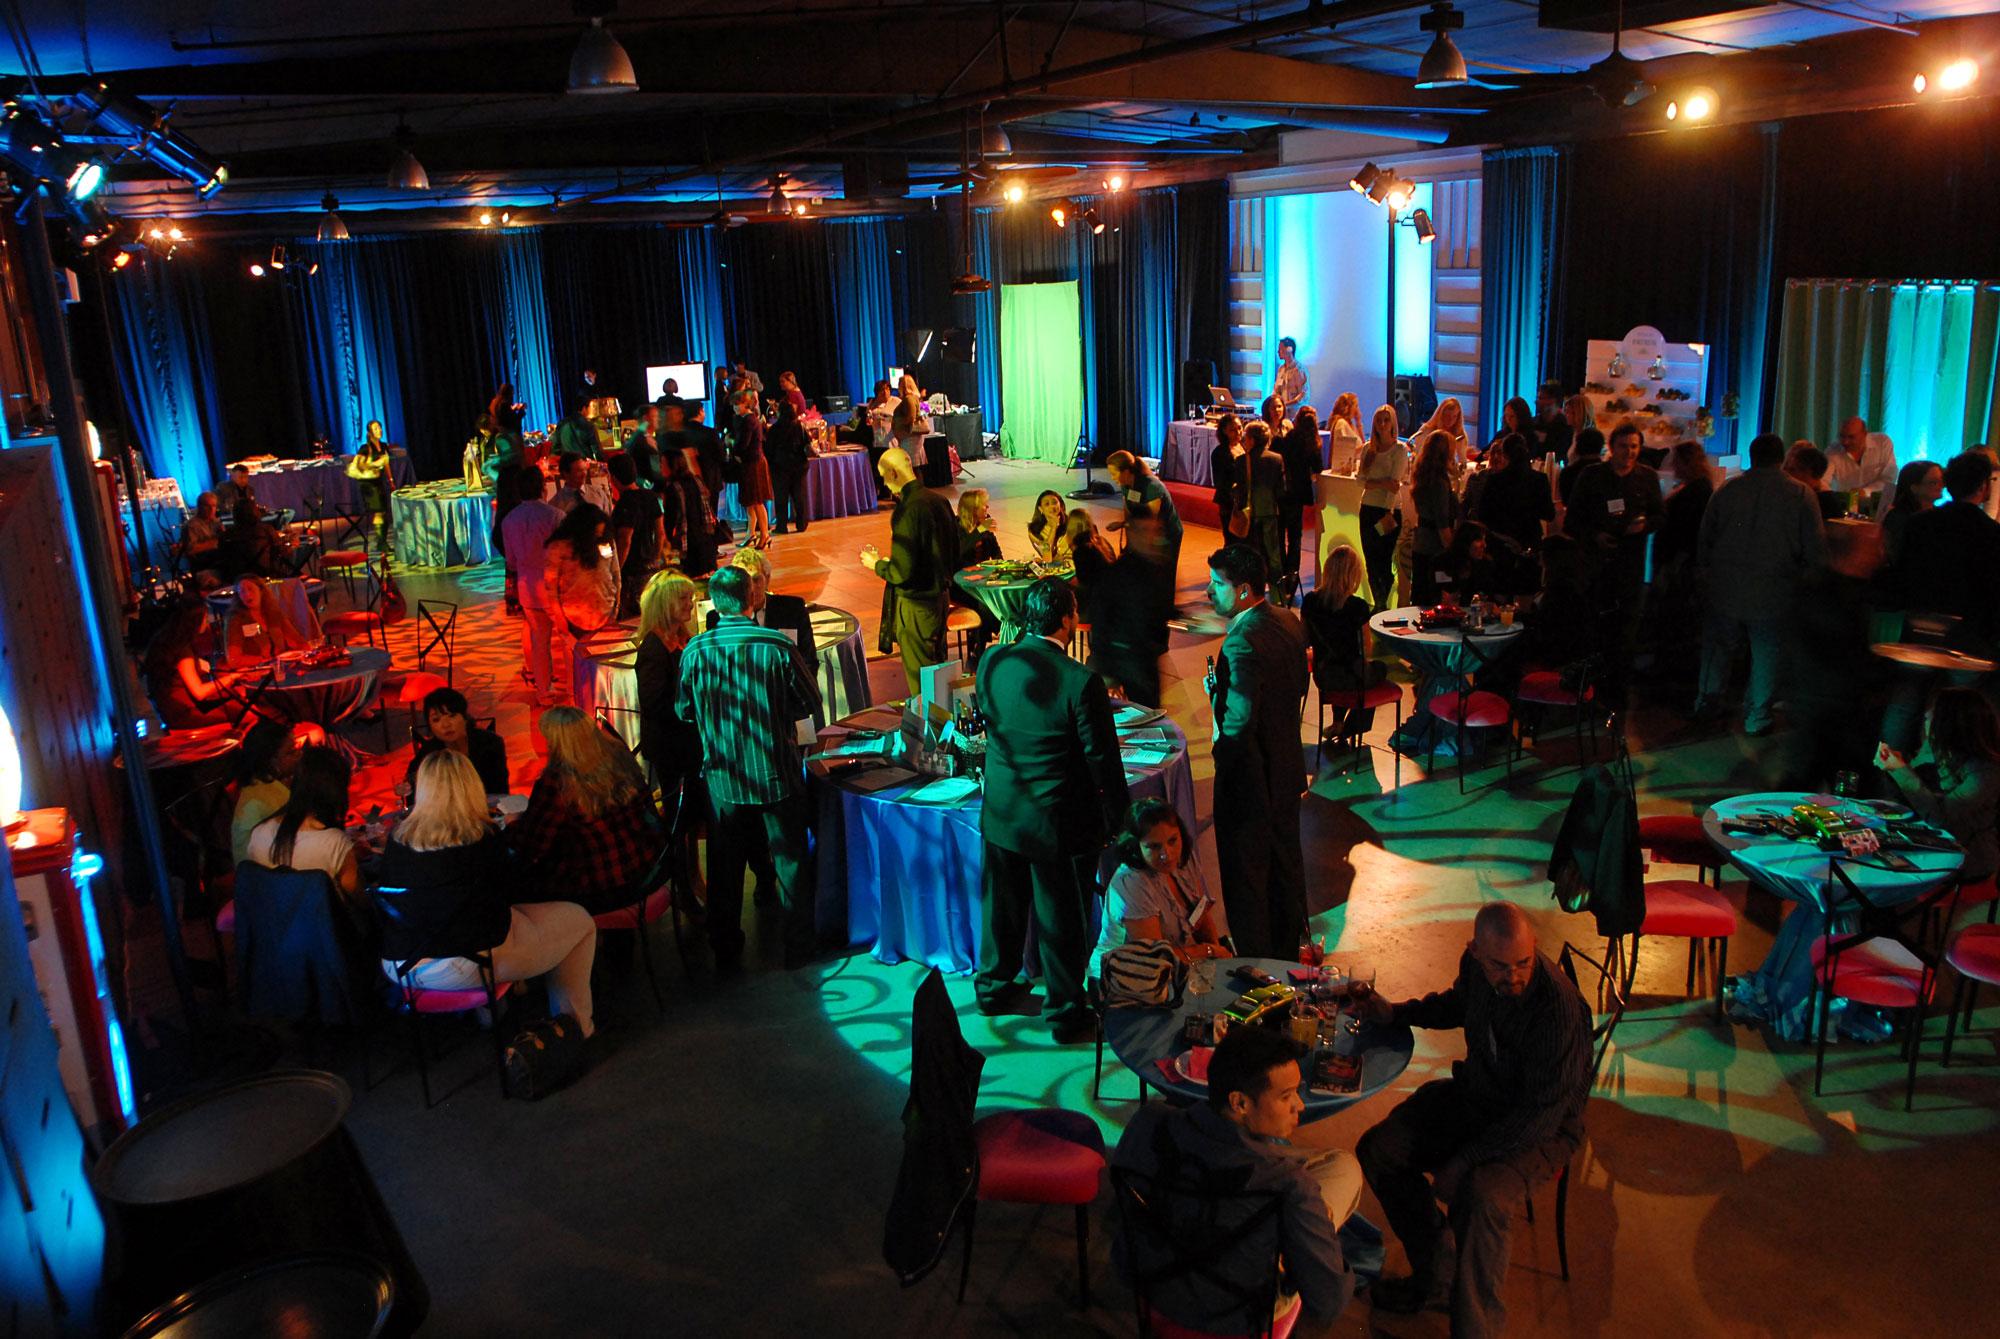 packard-ballroom-with-people.jpg